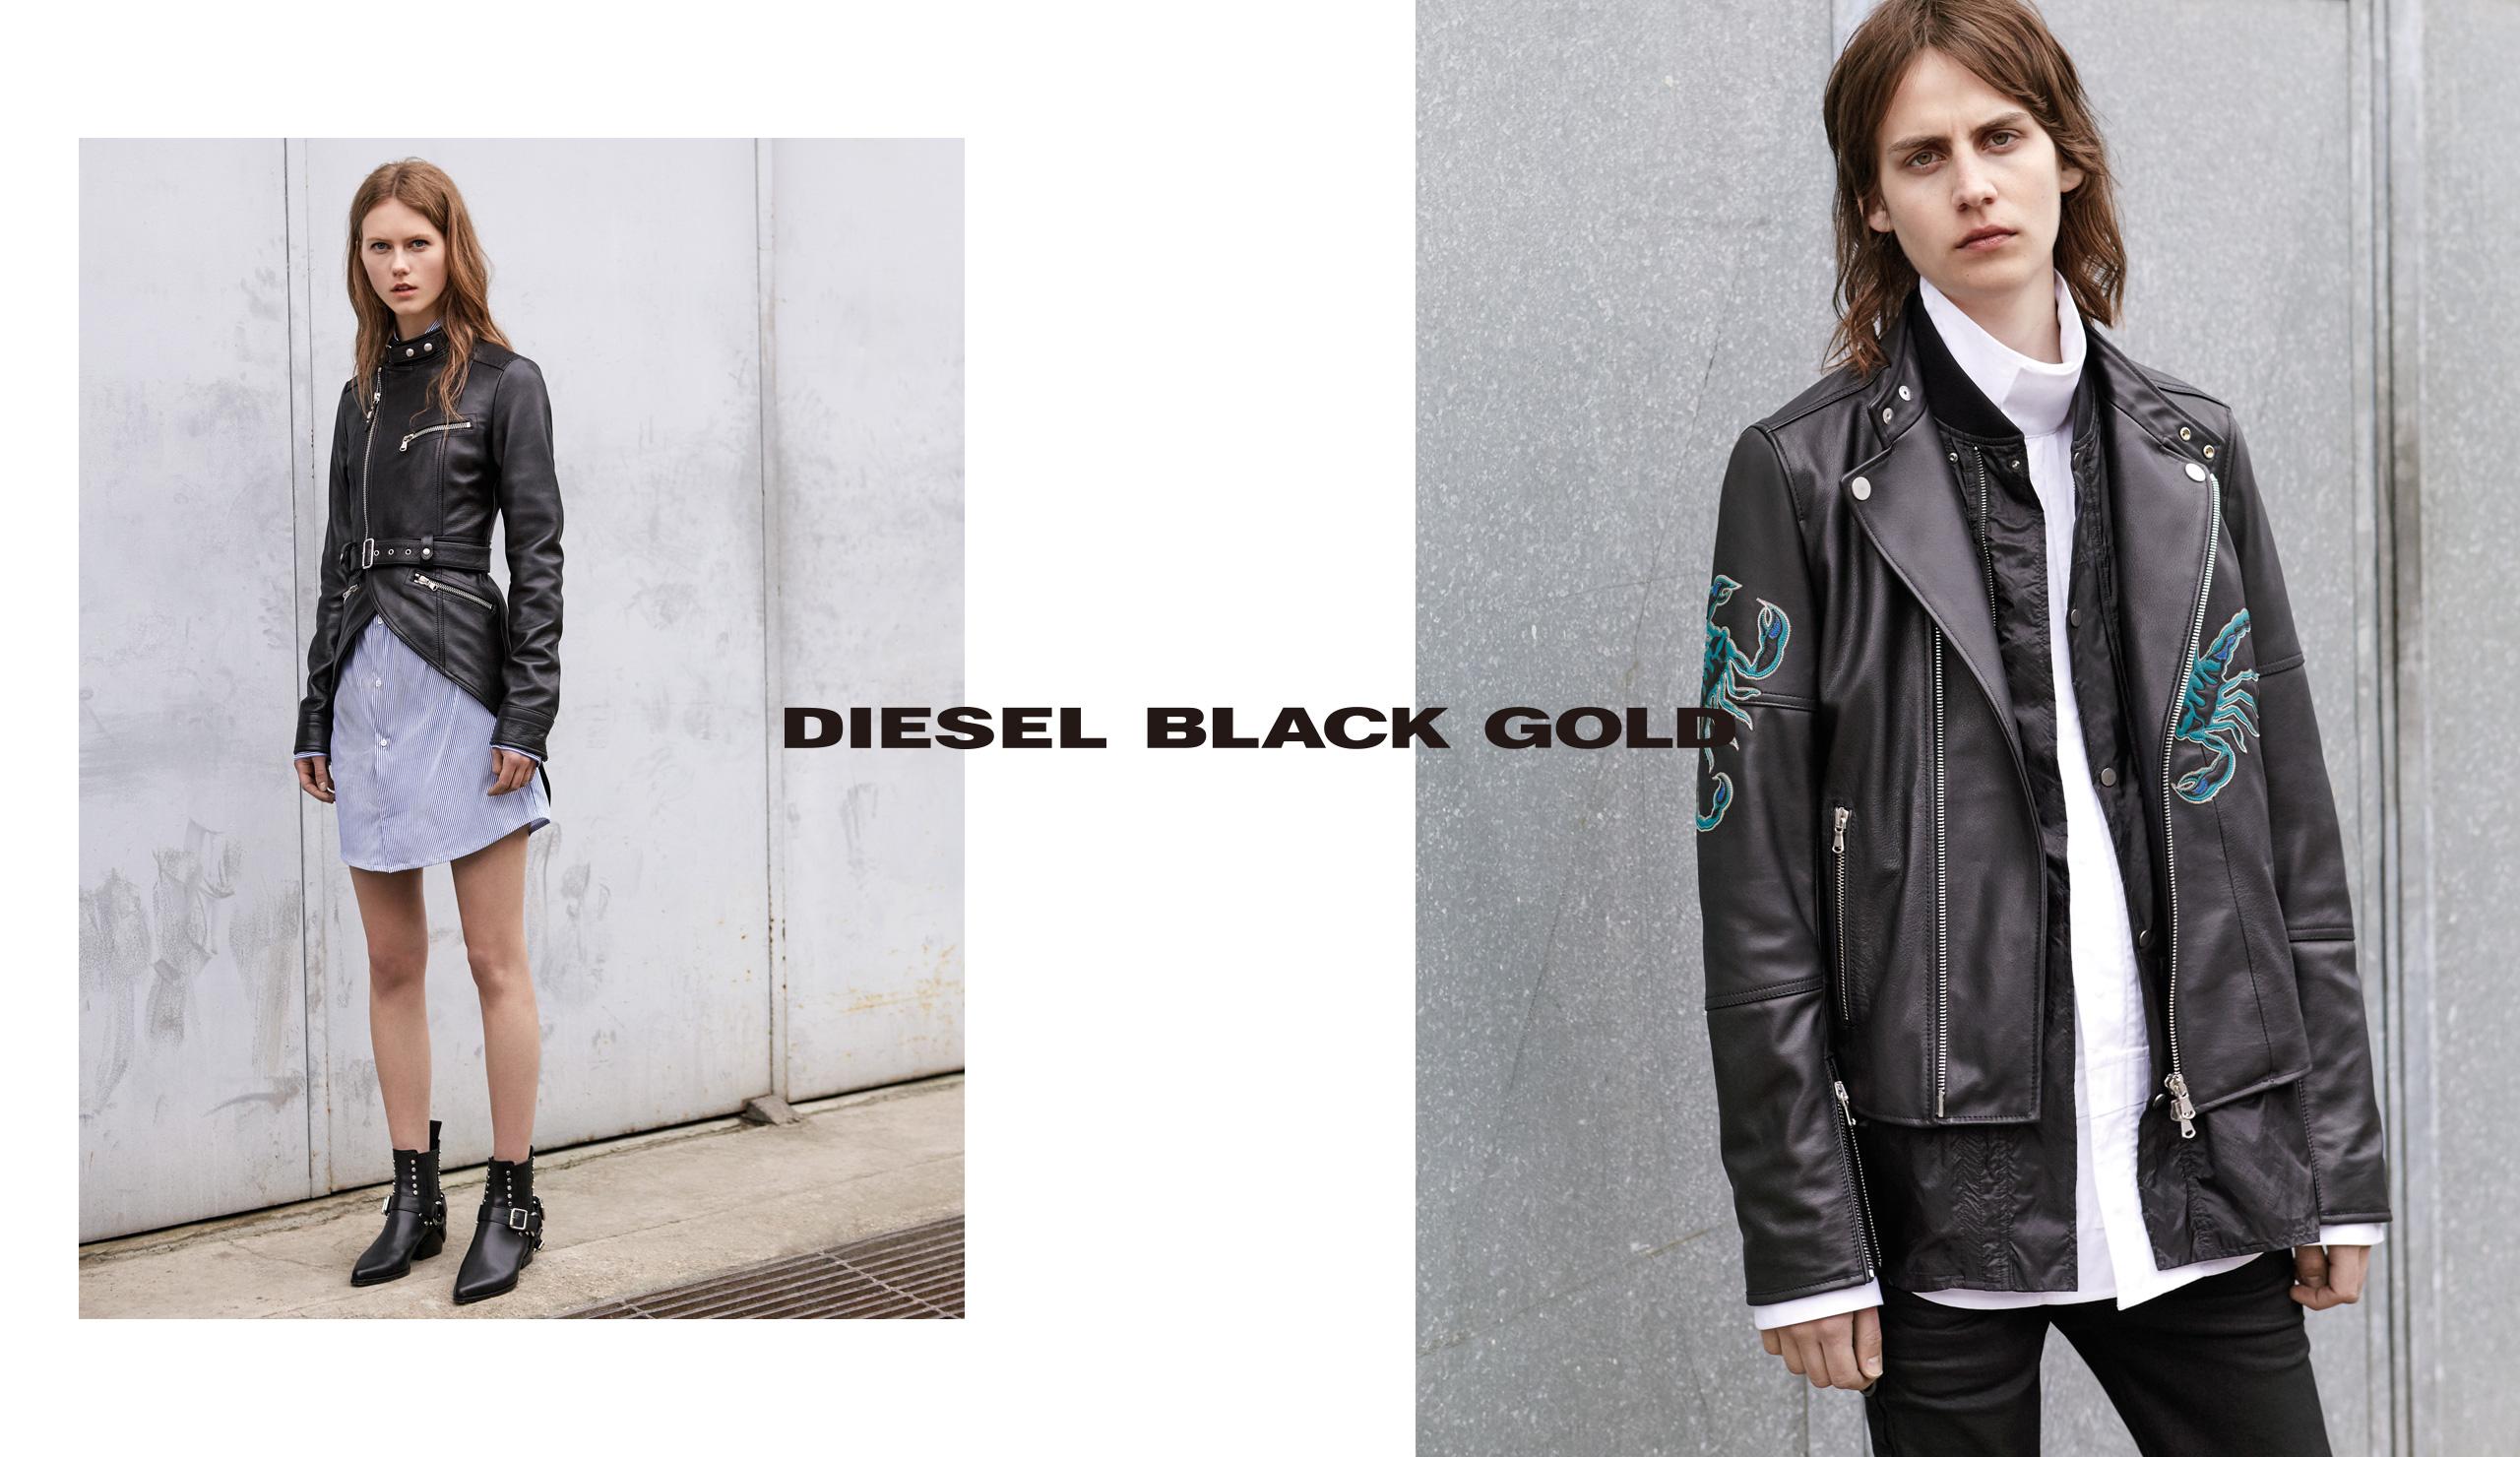 DIESEL BLACK GOLD OUTER LOOK